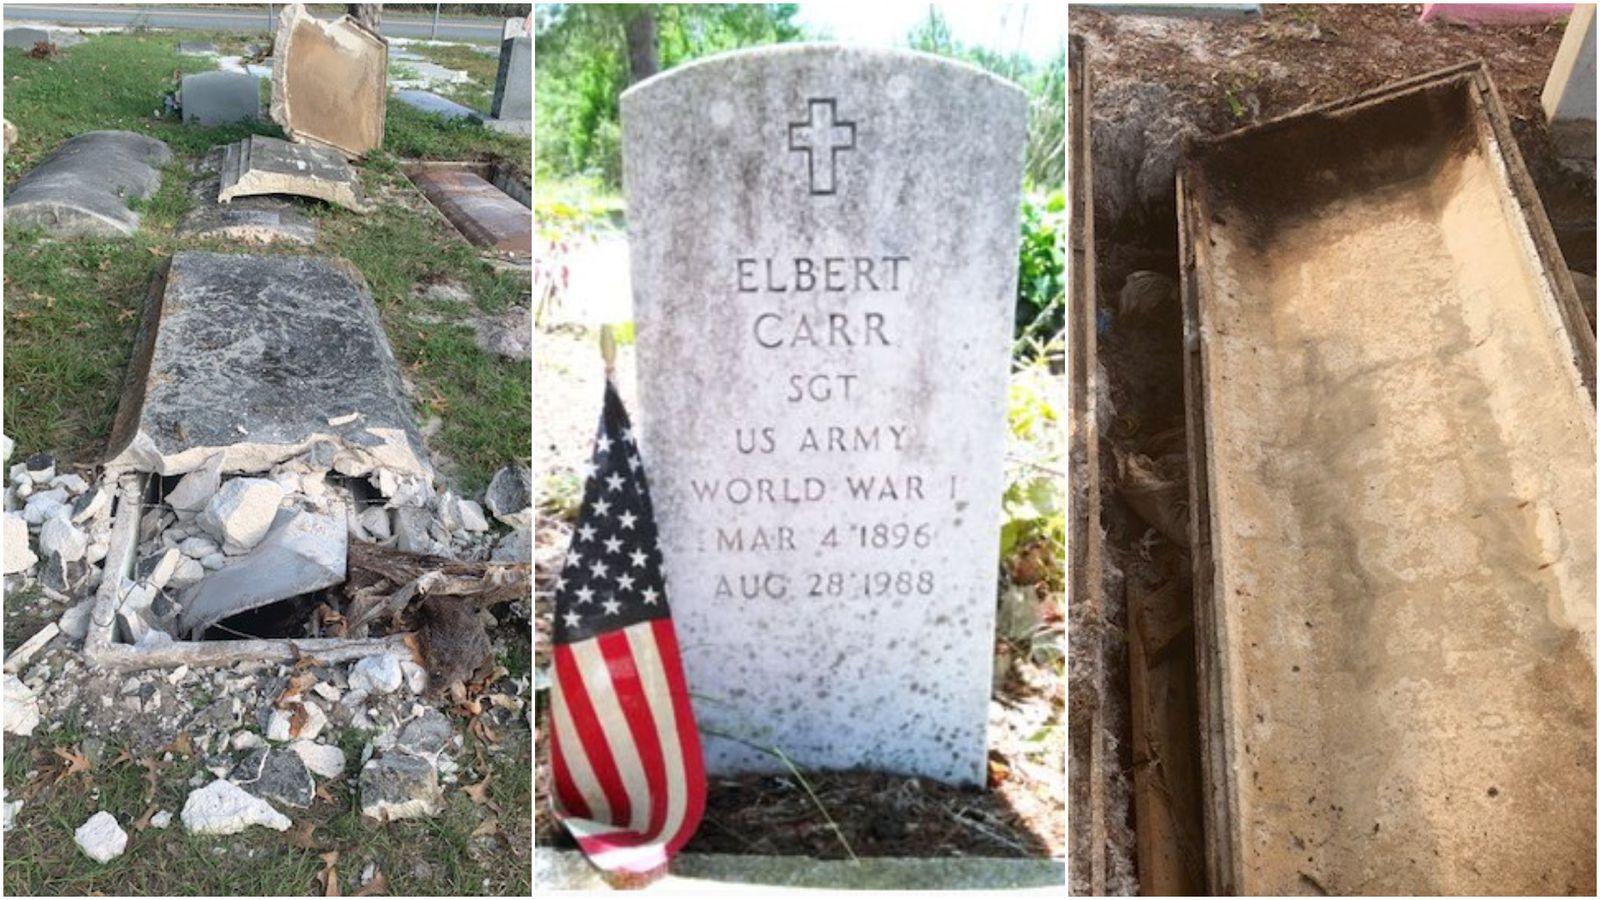 Florida Men Arrested for Robbing the Graves of Heroic Veterans